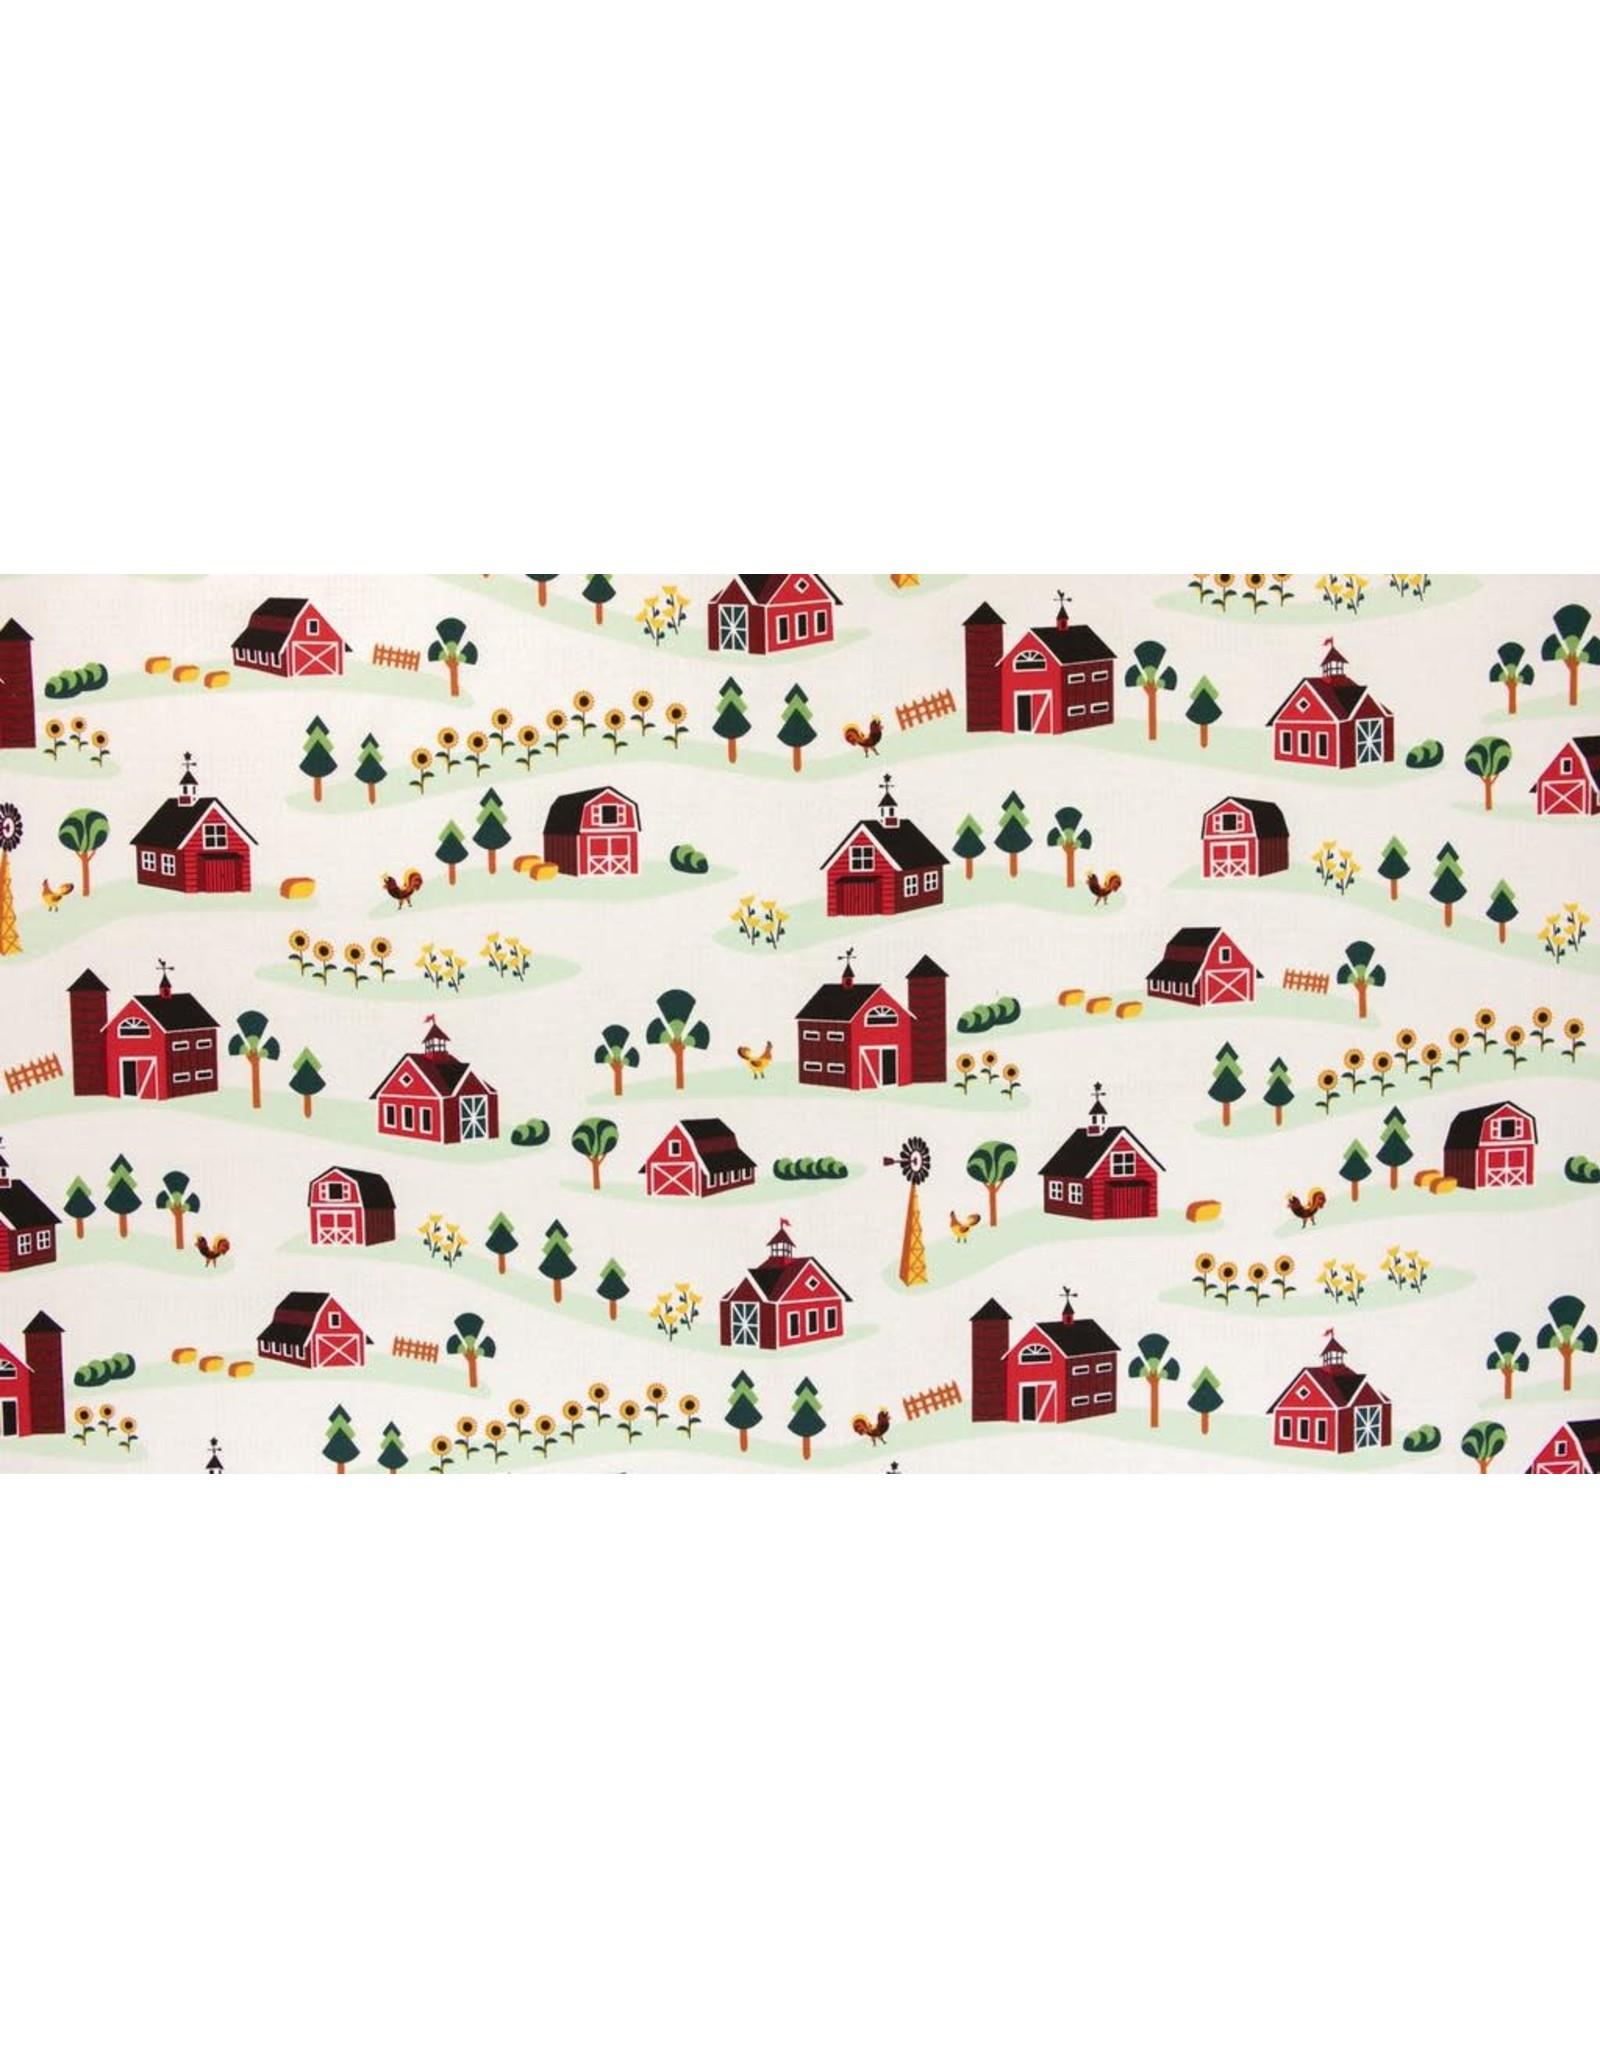 RJR Fabrics Lil' Bit Country, Barnyard in Storybook, Fabric Half-Yards RJ1900-ST1